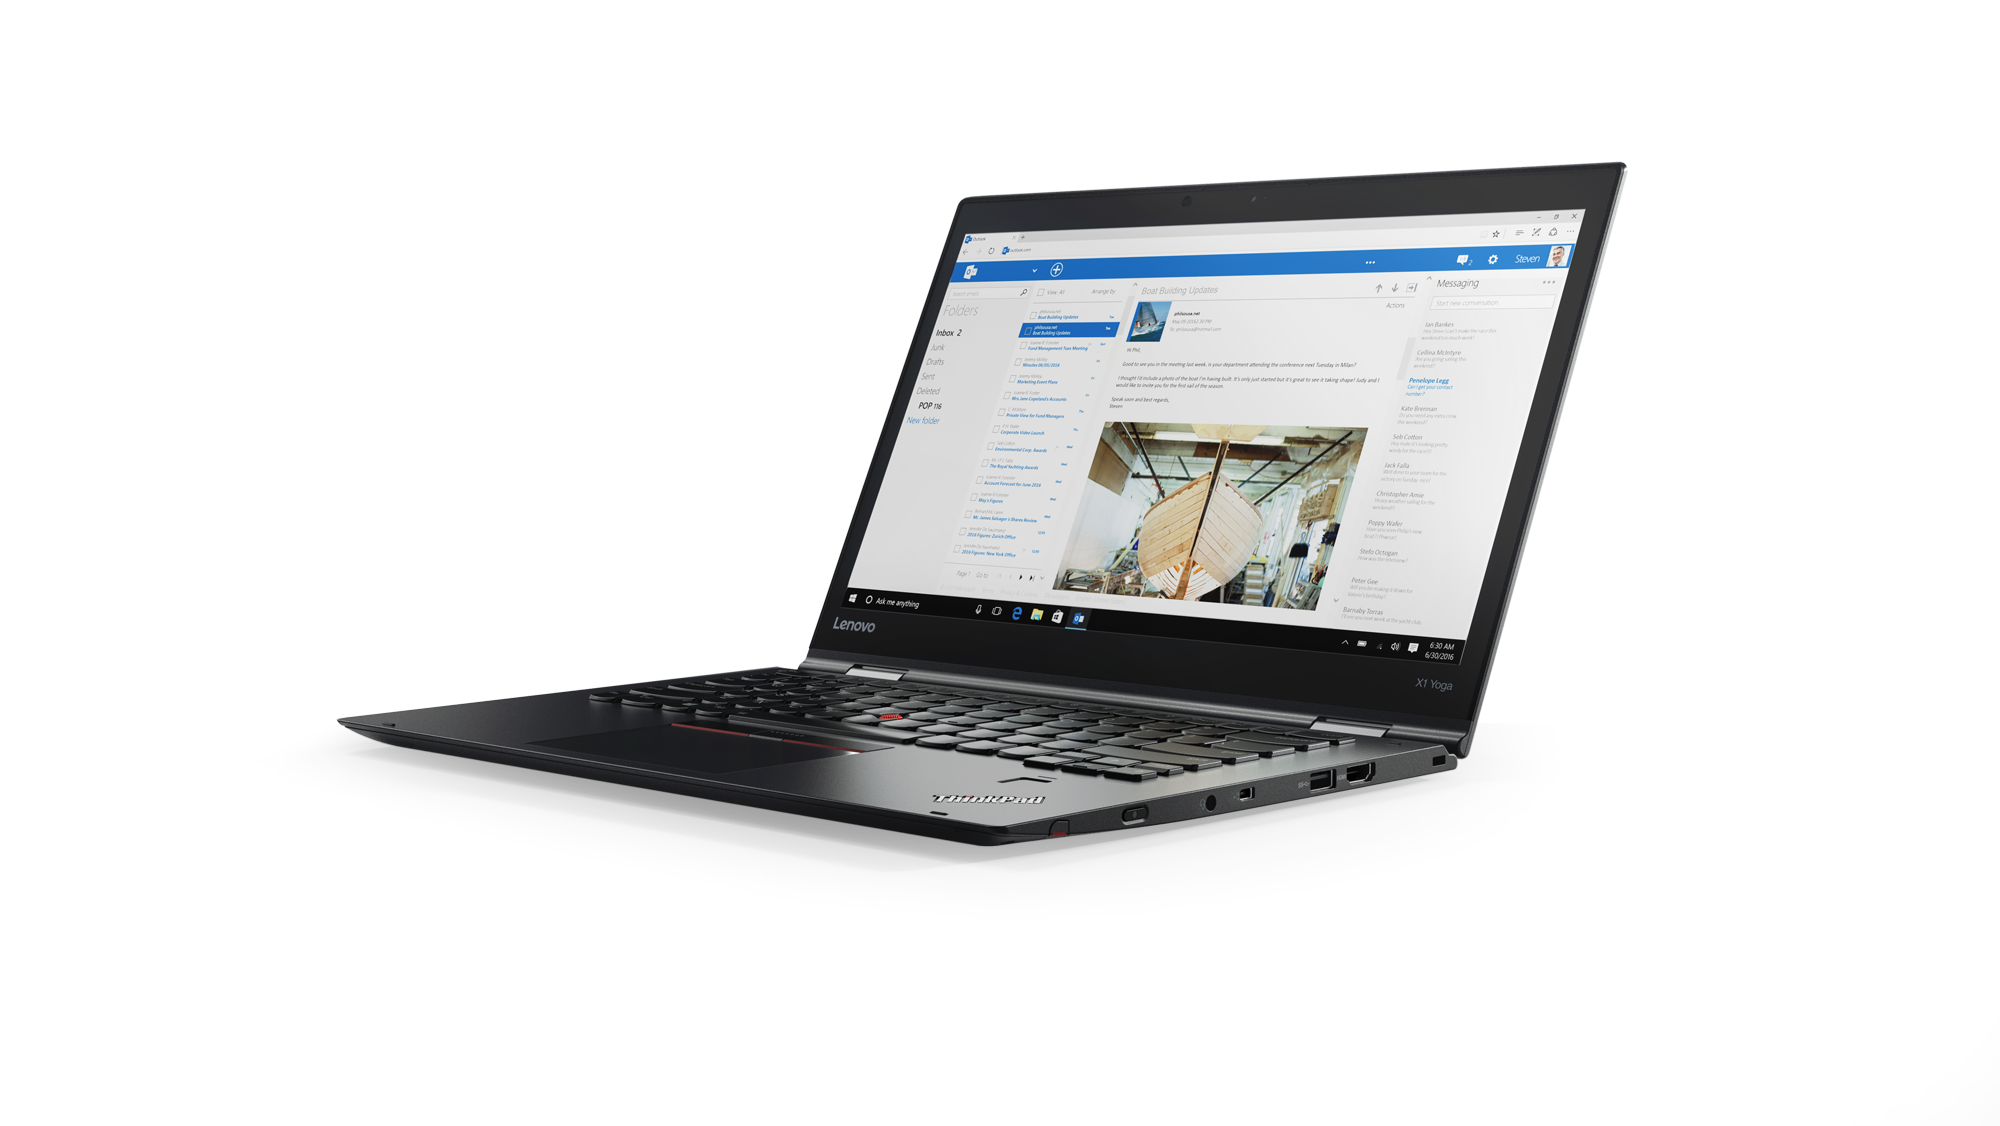 Lenovo Thinkpad X1 Yoga 3 14WQHD/i5-8250U/8G/256SSD/4G/W10P/černý